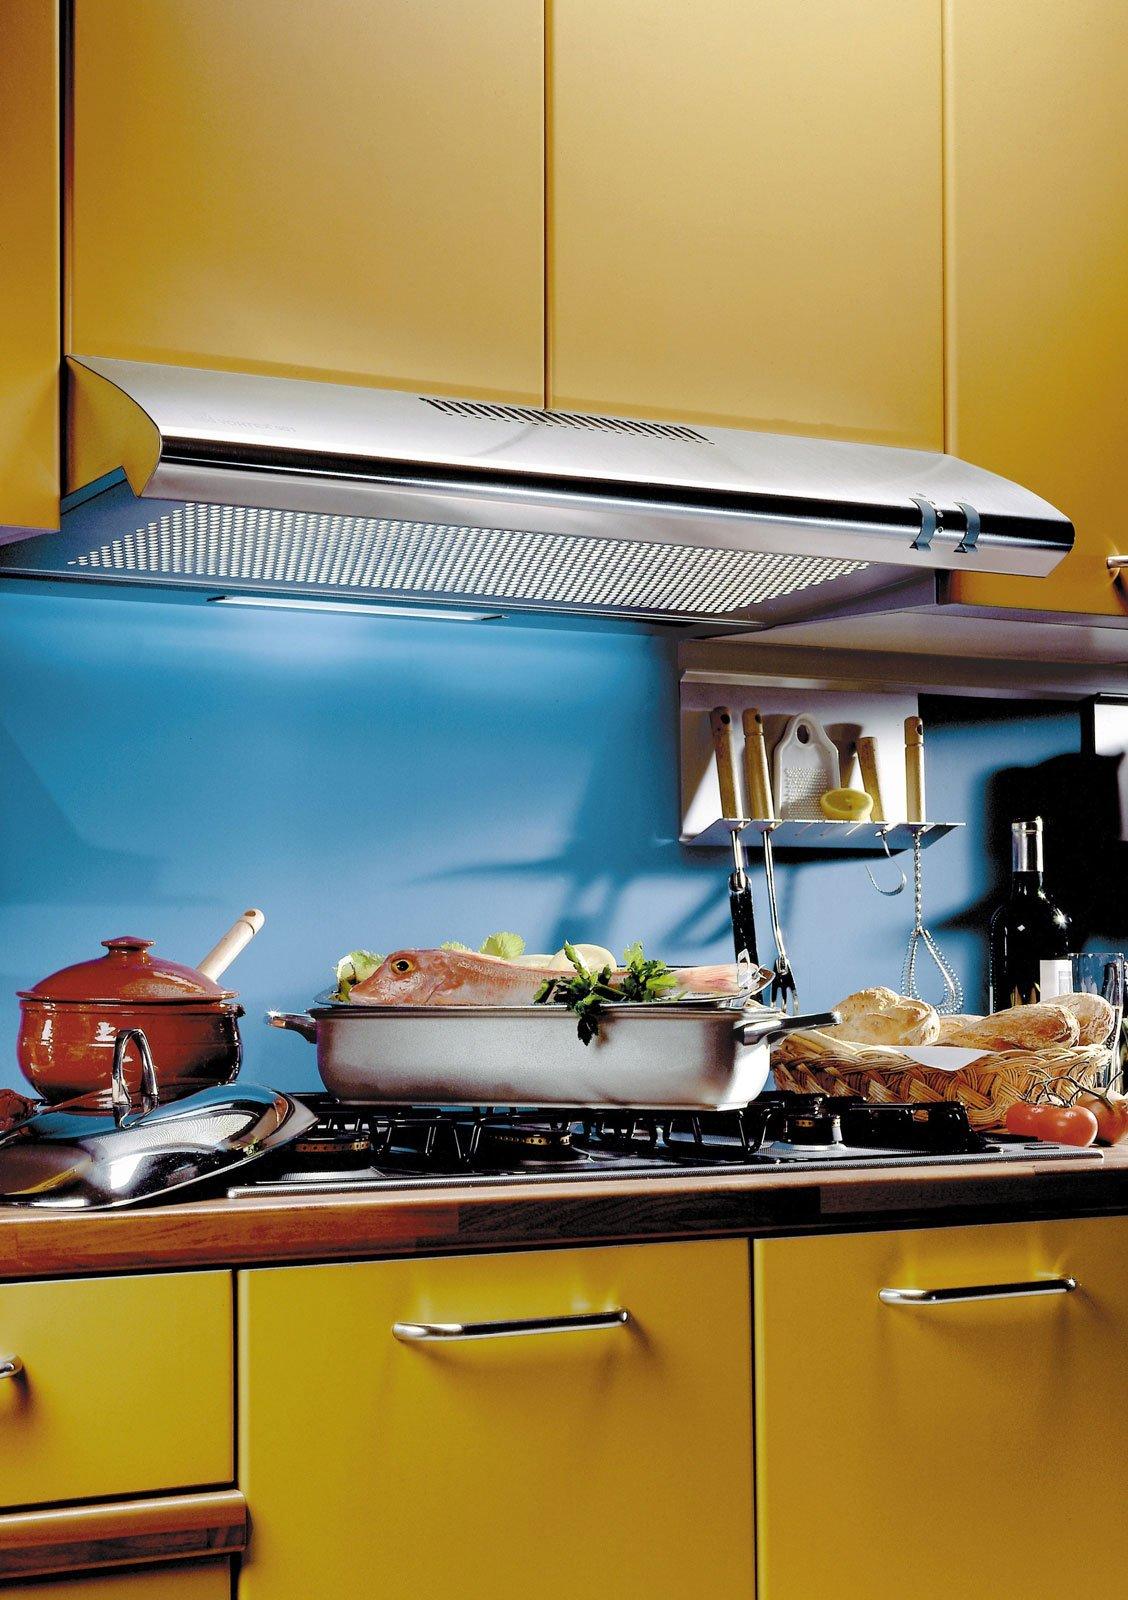 Cappe obbligatorie ma anche indispensabili specie nella cucina a vista cose di casa - Misure cappa cucina ...